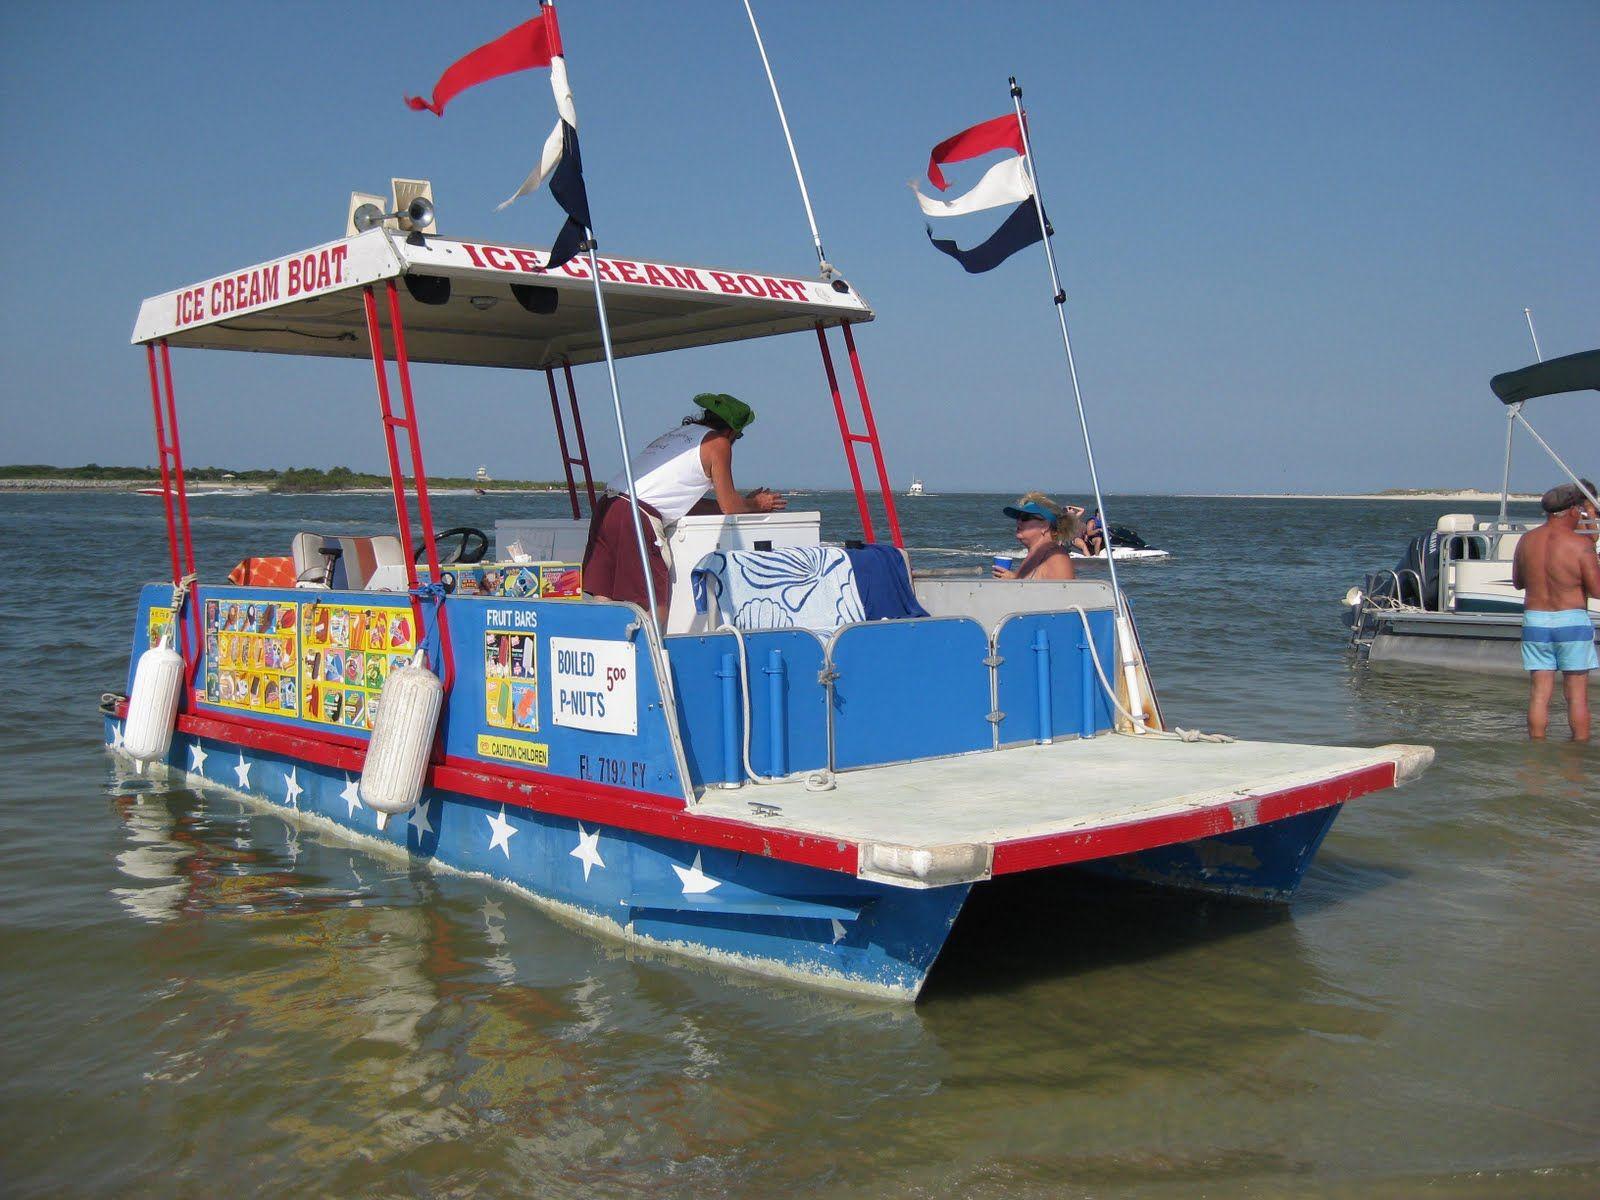 City Island Ice Cream Boat | New smyrna beach florida, New ...